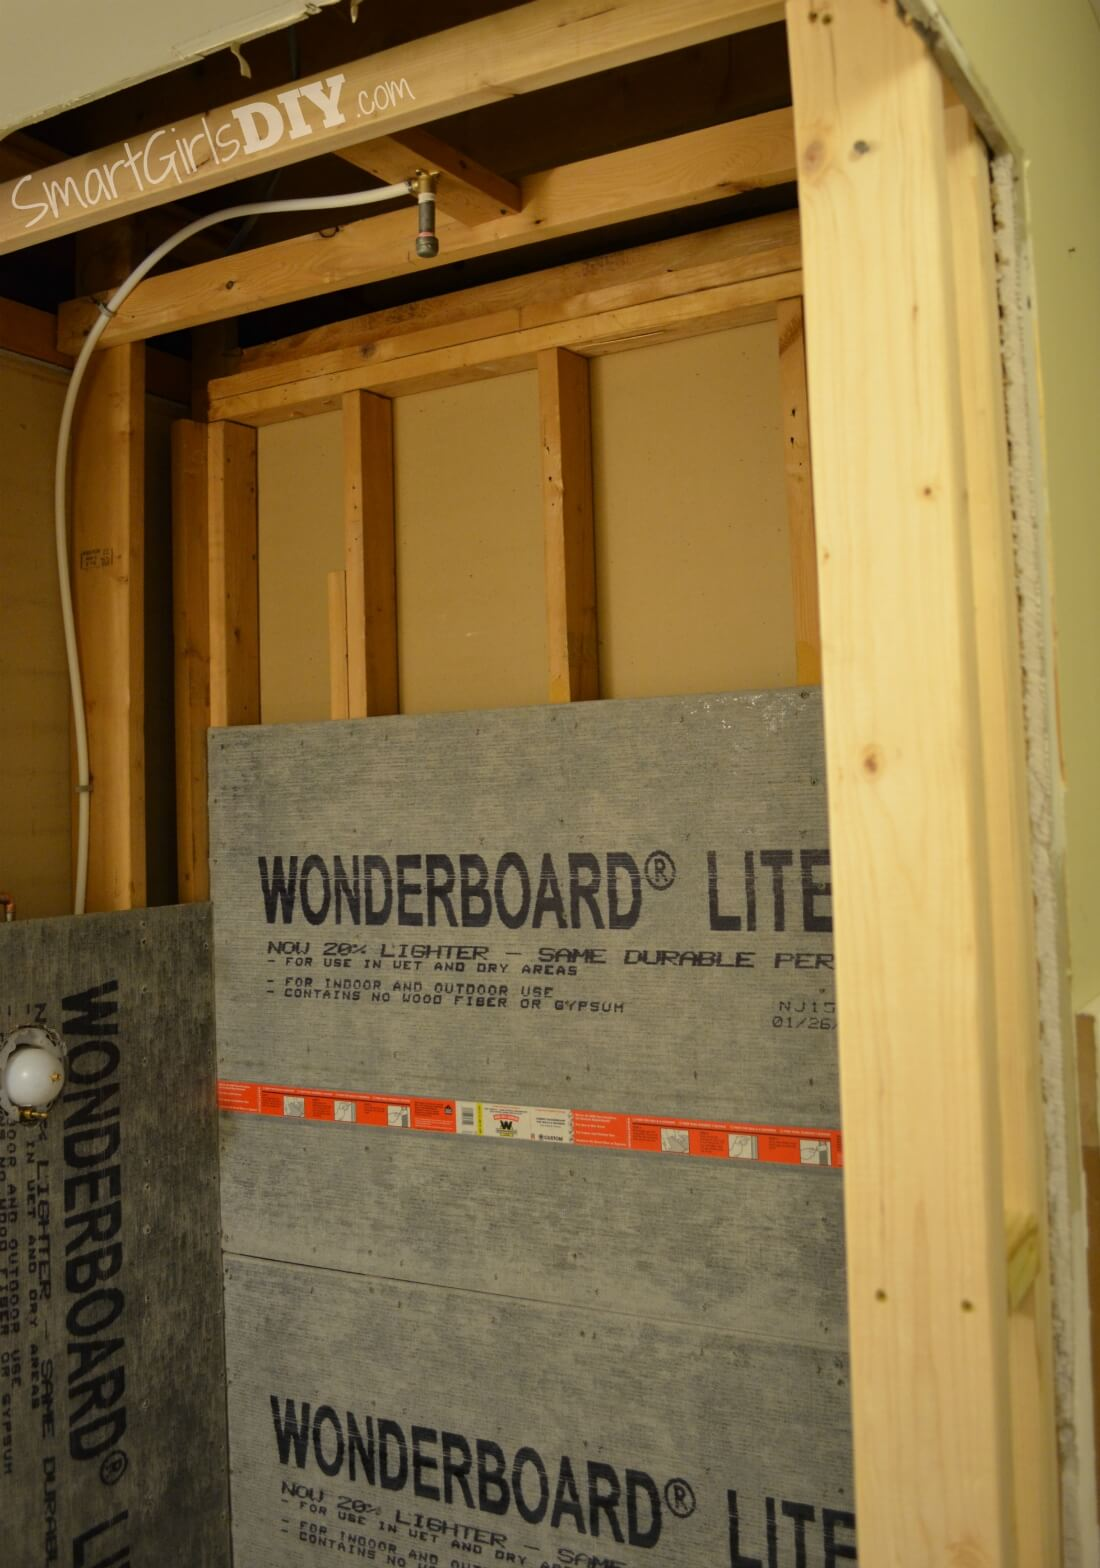 Shower Walls With Wonderboard